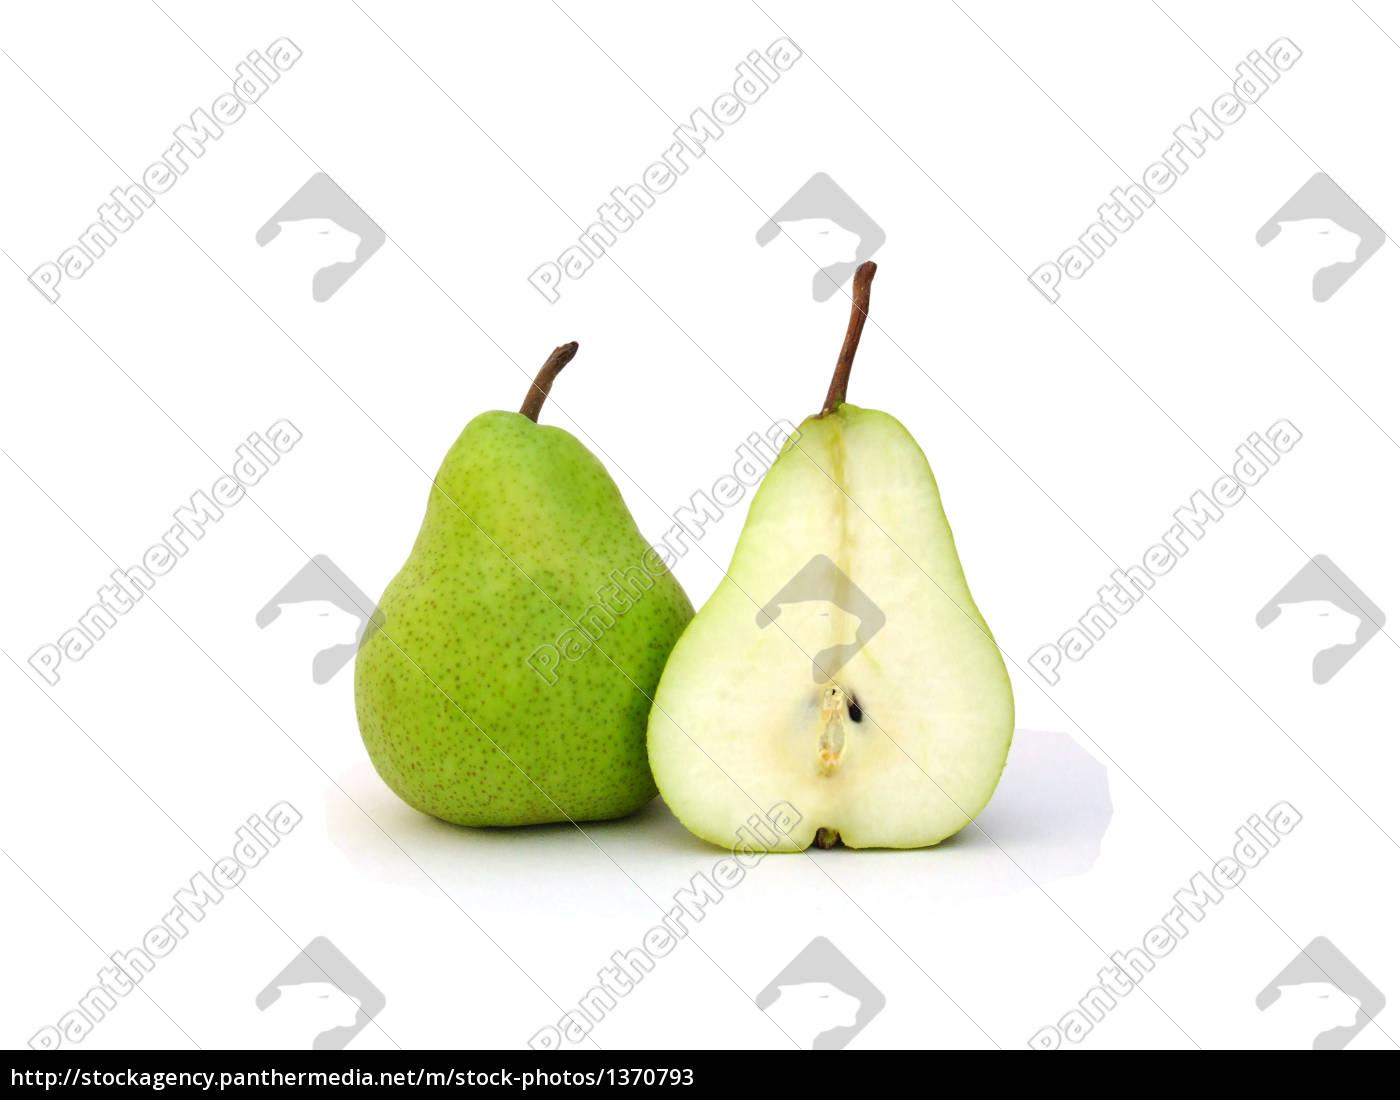 pears - 1370793